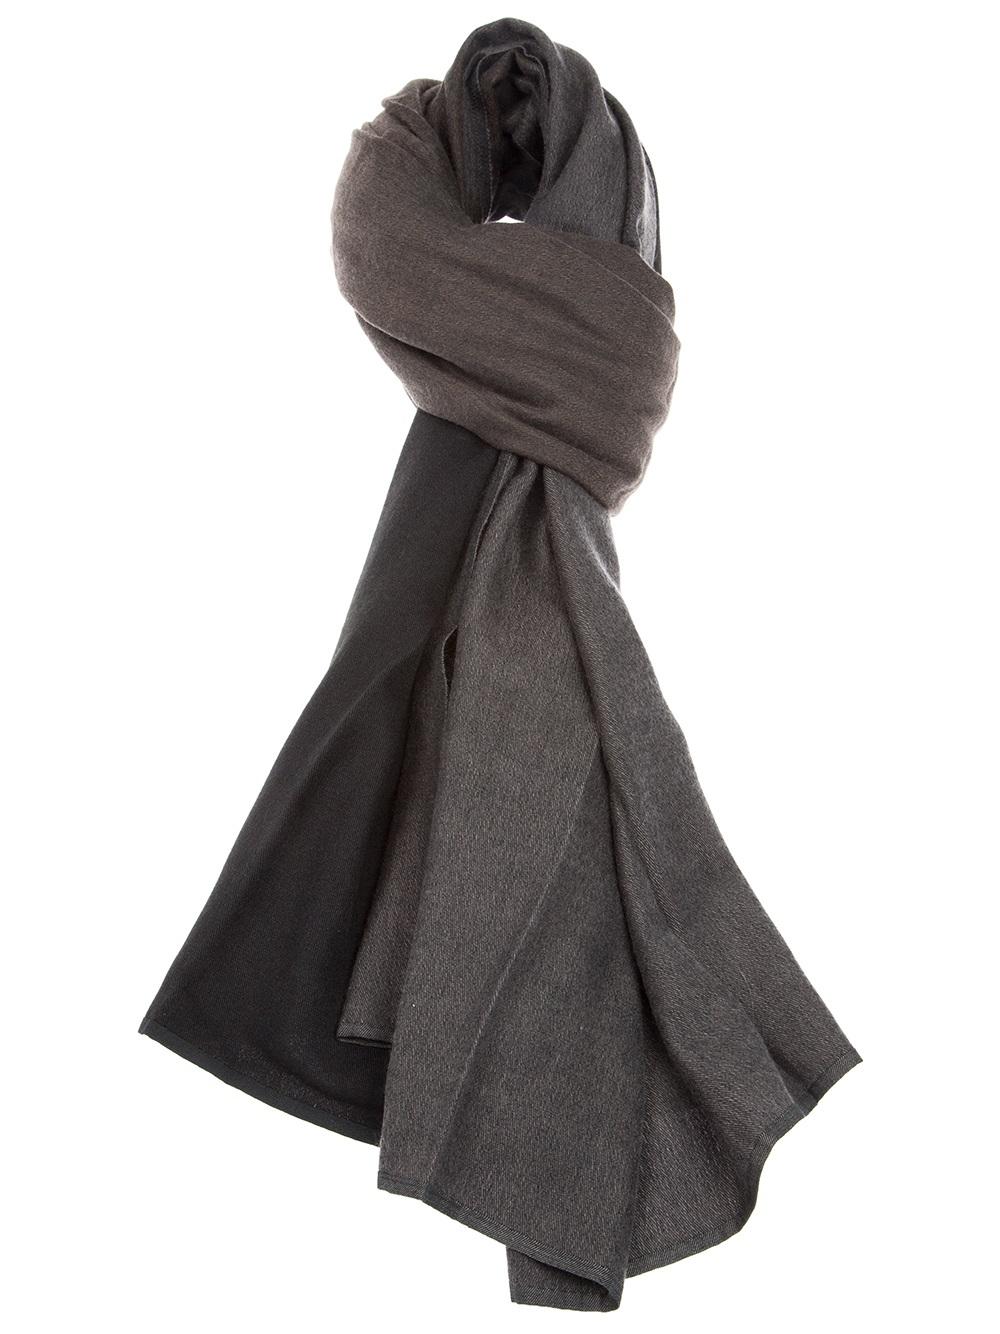 7f7f301fae Lyst - Denis Colomb Twotone Blanket in Black for Men